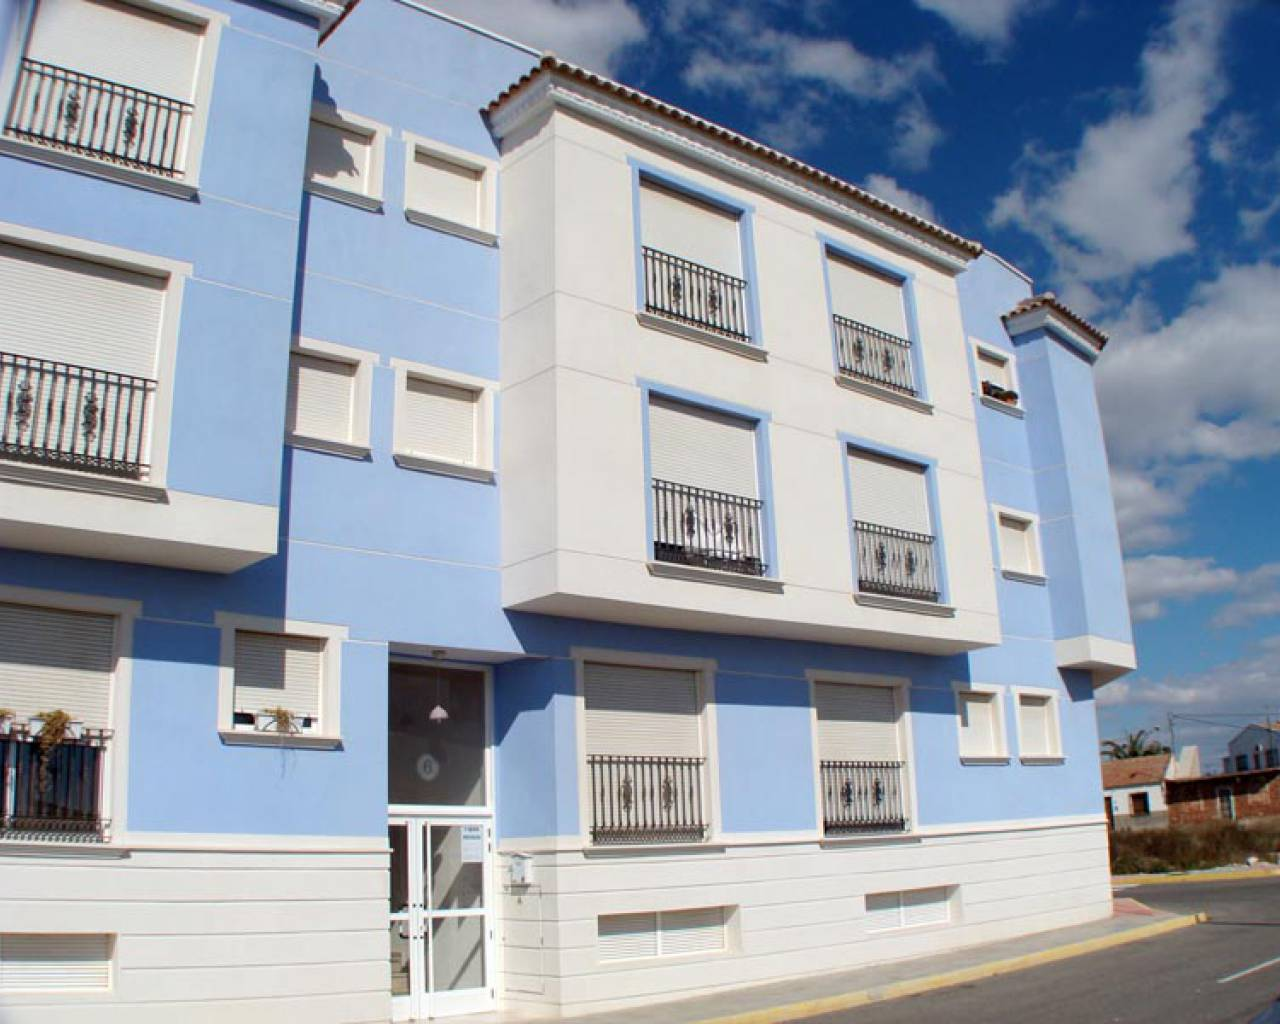 nieuwbouw-appartement-los-montesinos_1197_xl